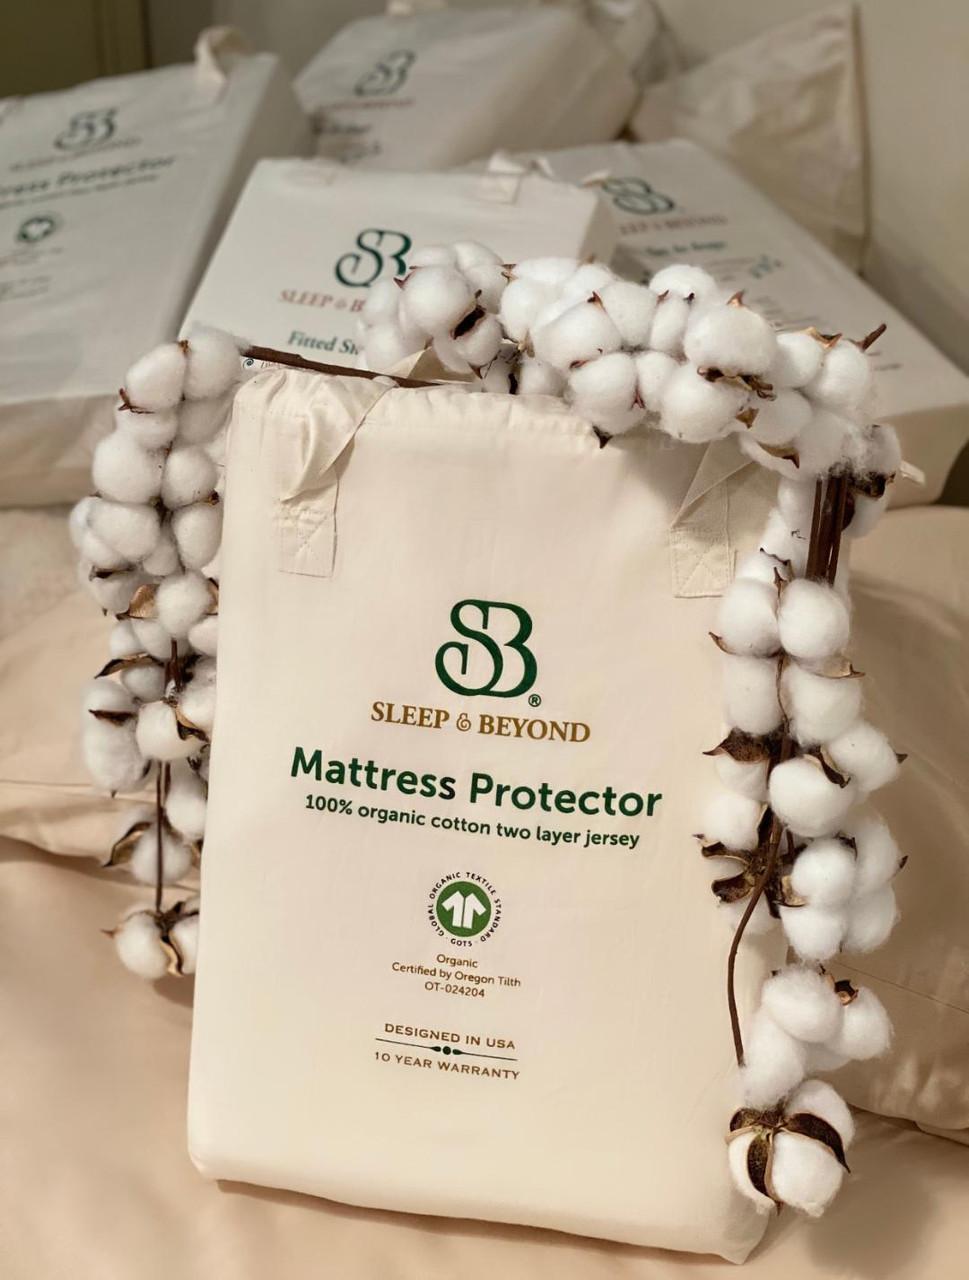 Sleep & Beyond 100% Organic Cotton Waterproof Mattress Protector Wool 2